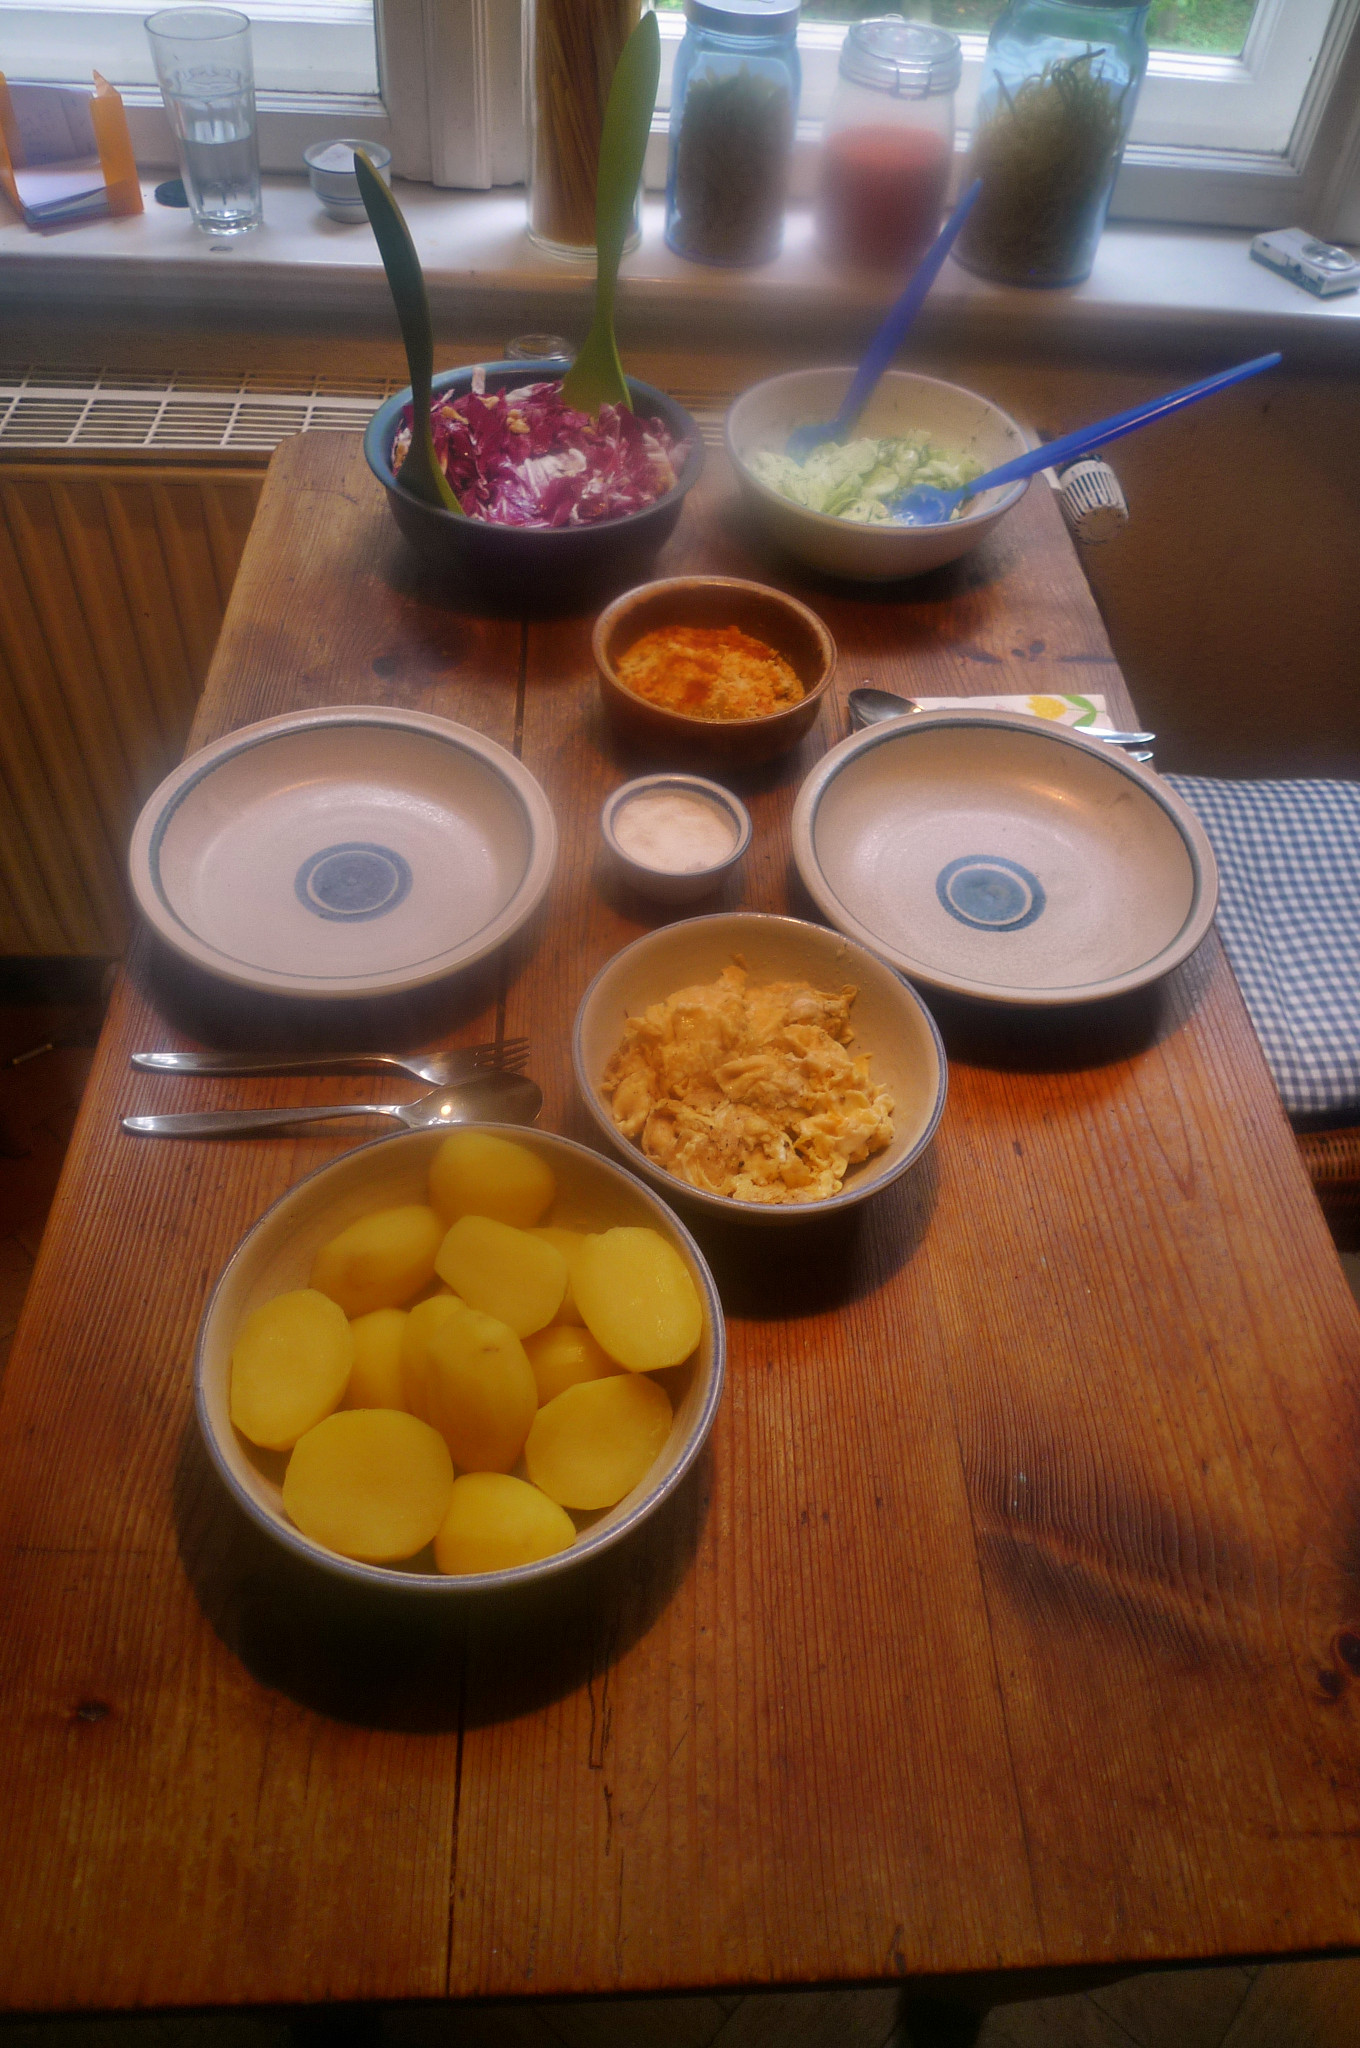 Kartoffel,Rührei,Salate,Humus -17.10.14   (4)